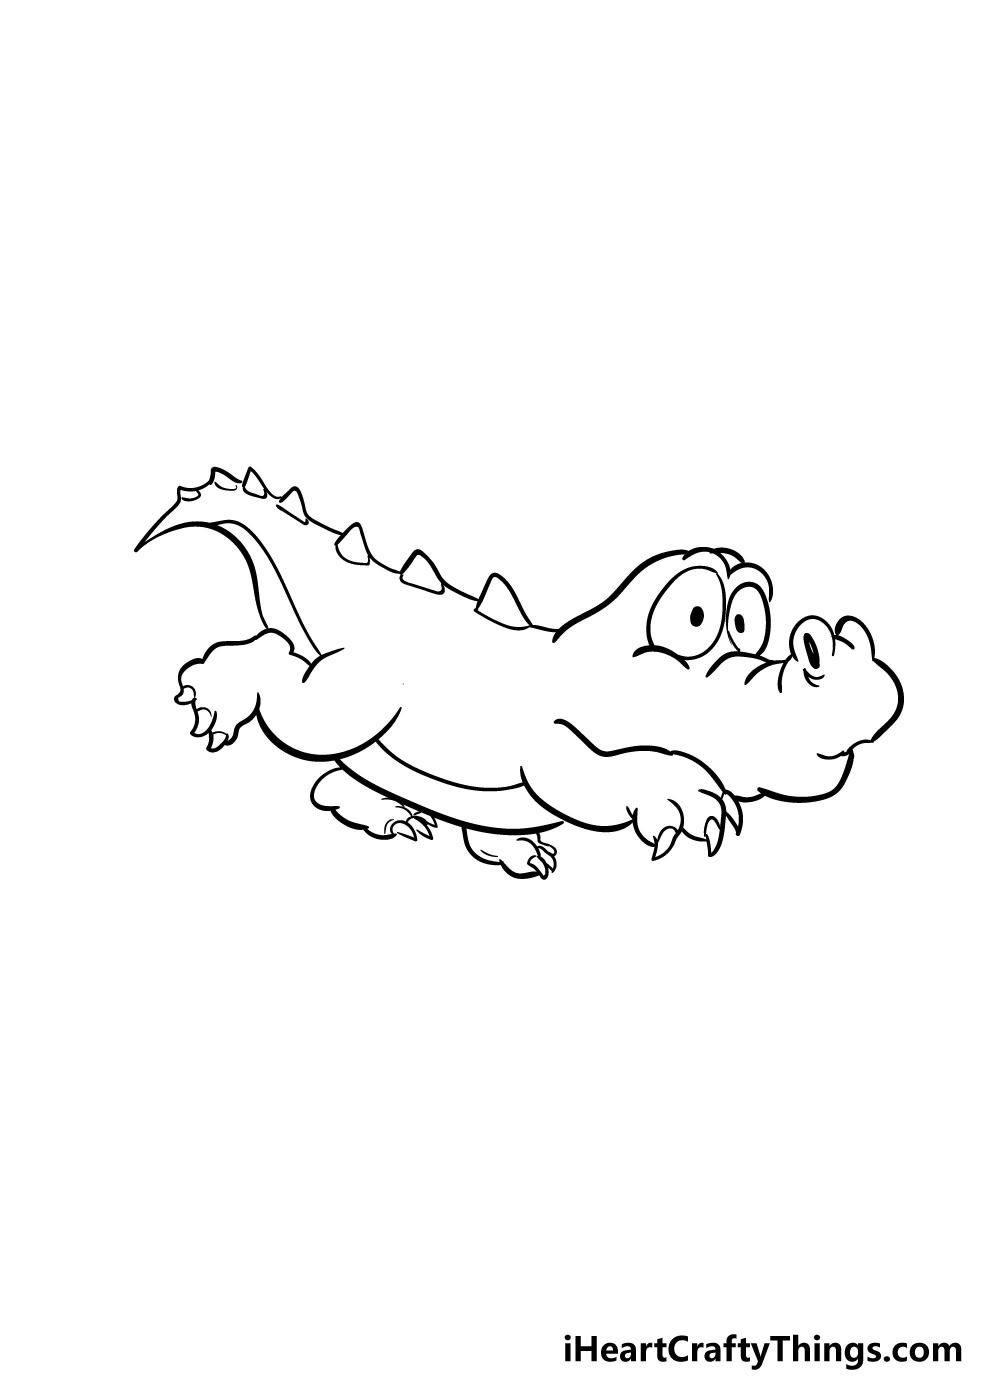 crocodile drawing step 5